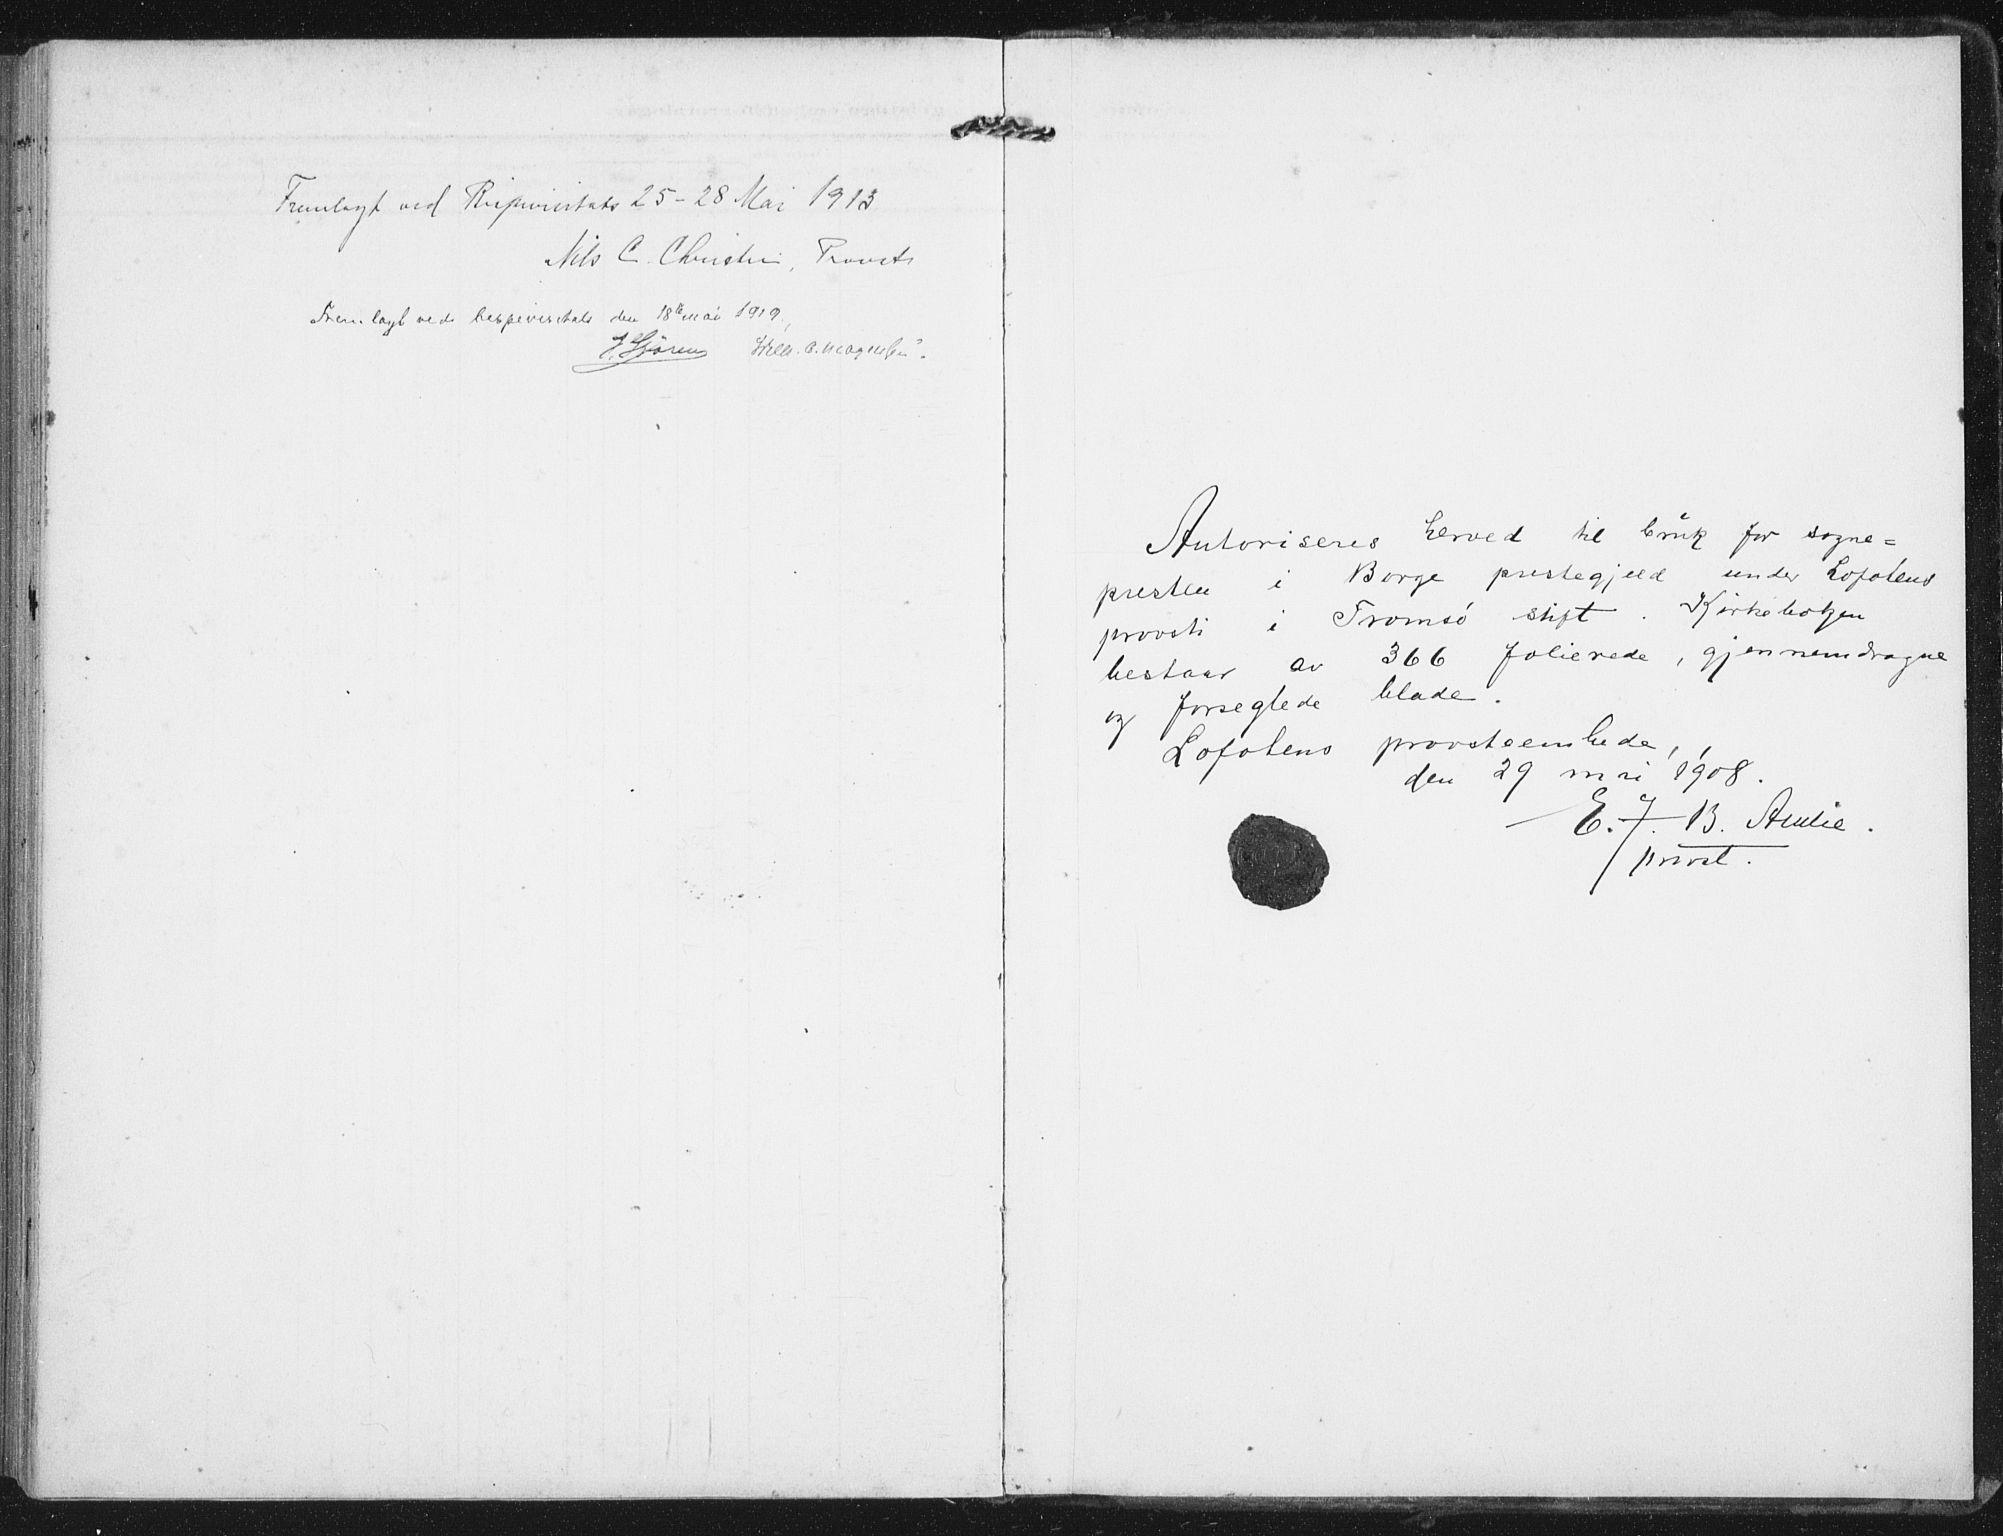 SAT, Ministerialprotokoller, klokkerbøker og fødselsregistre - Nordland, 880/L1135: Ministerialbok nr. 880A09, 1908-1919